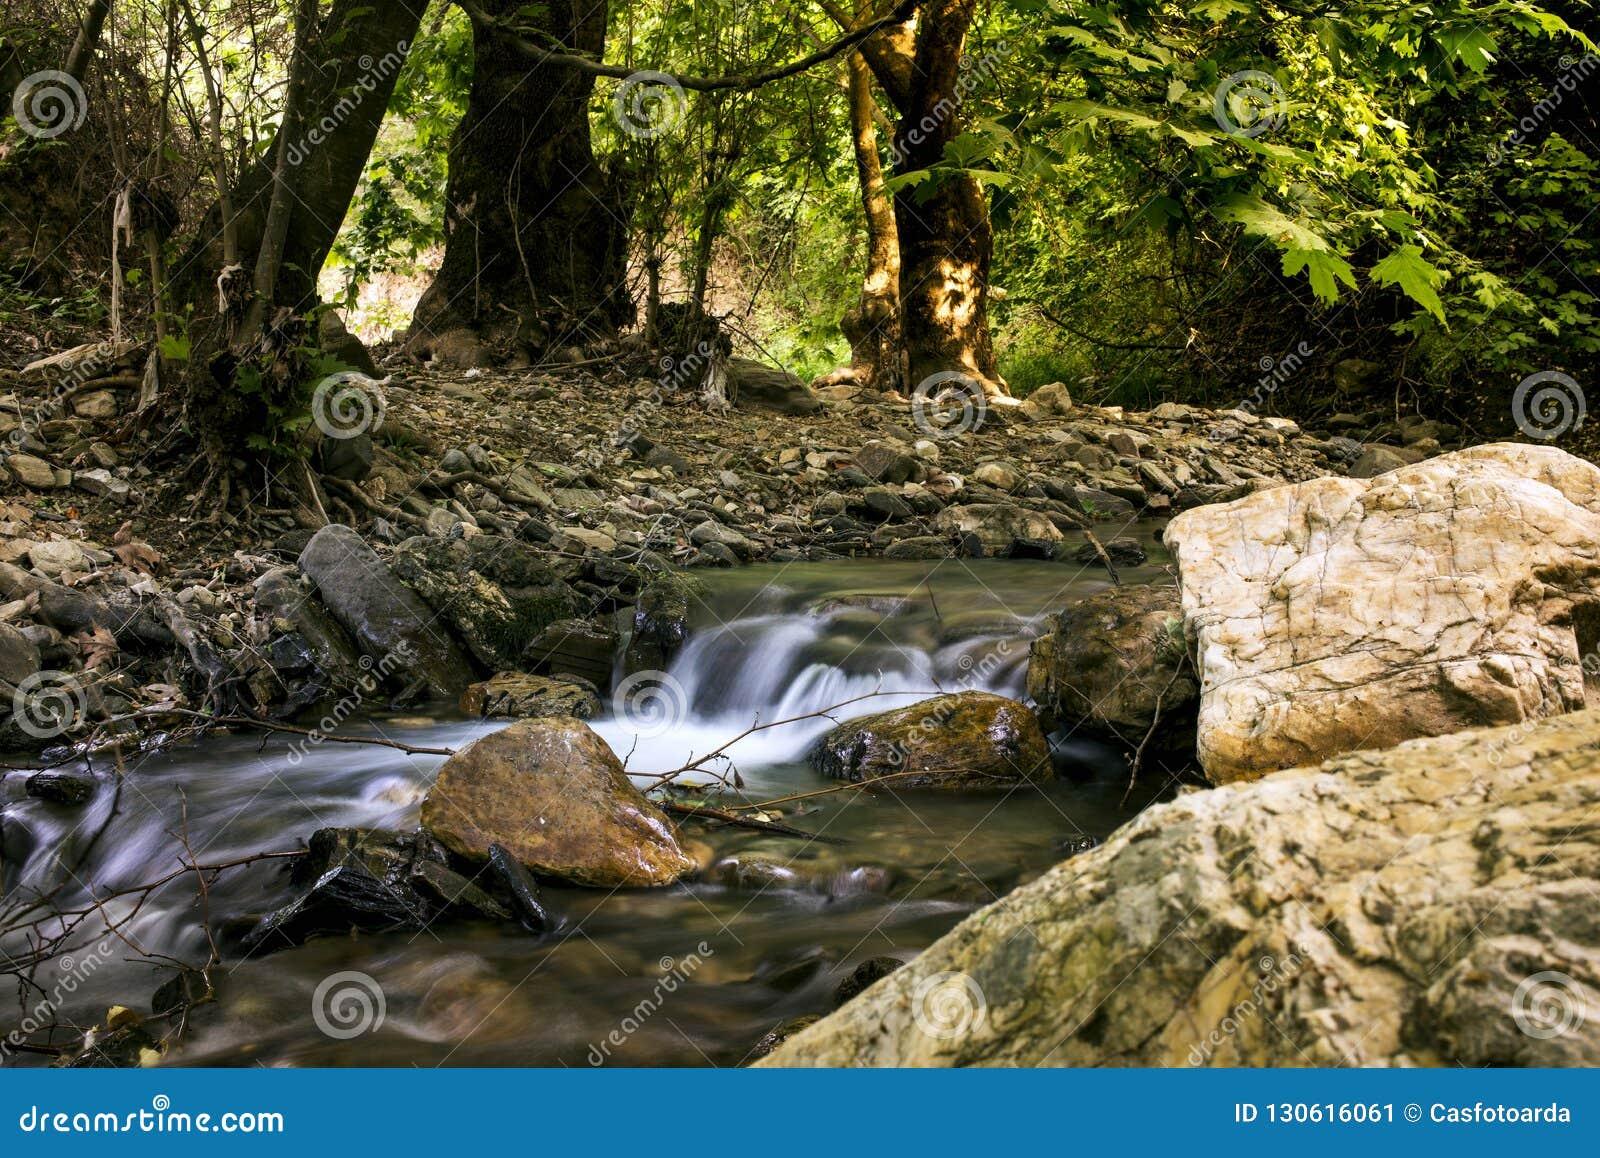 Water Stream In Izmir Turkey Kemalpasa Stock Image Image Of Cascade Foliage 130616061